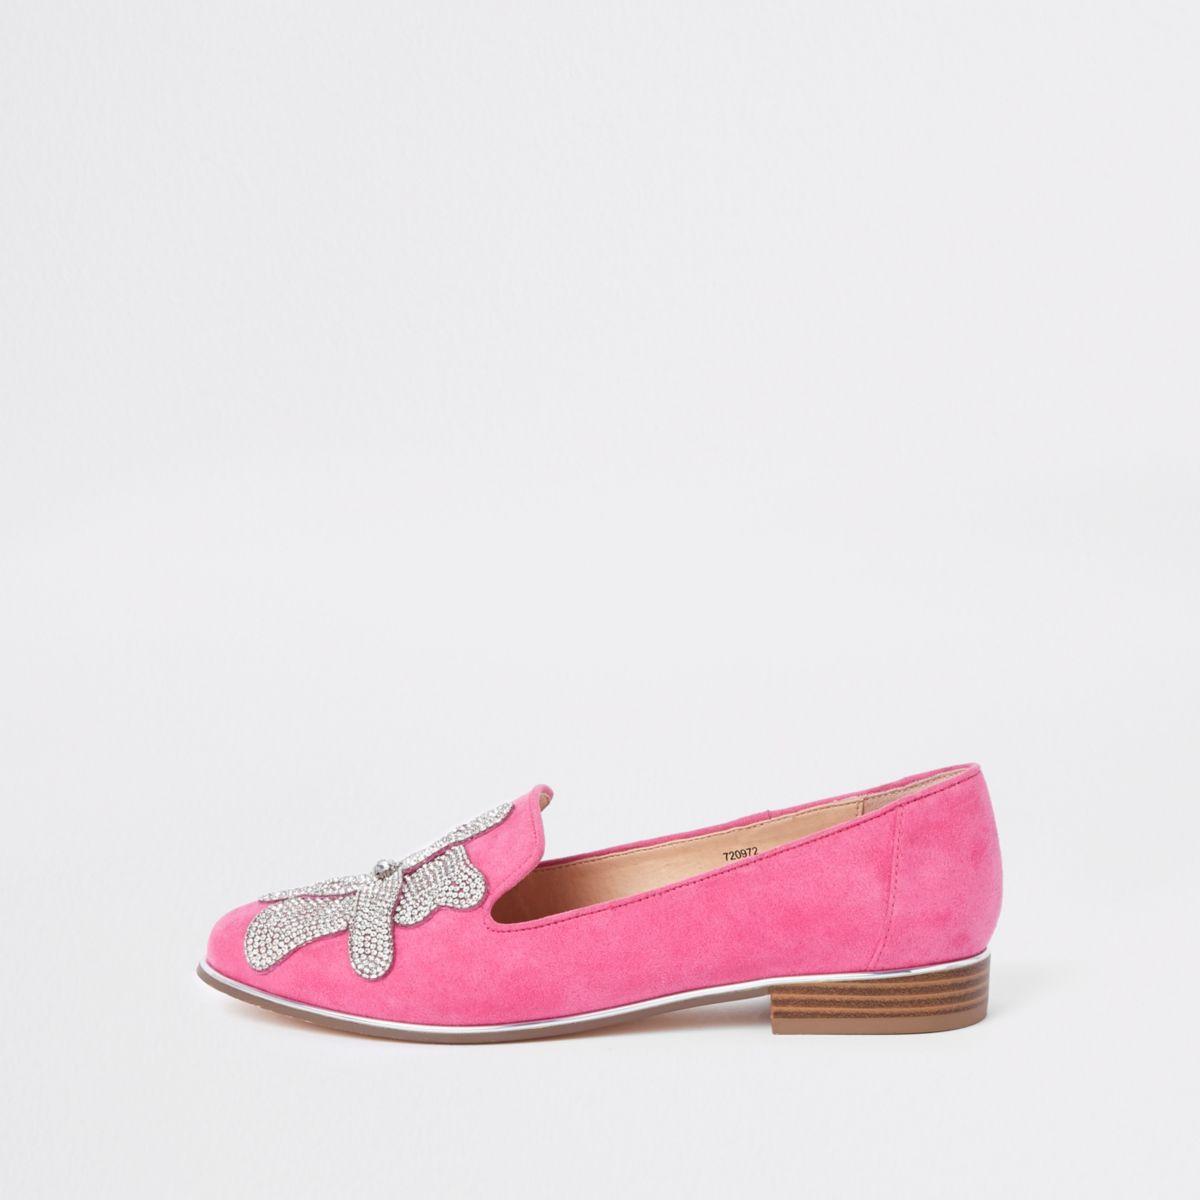 Pink floral rhinestone embellished loafers